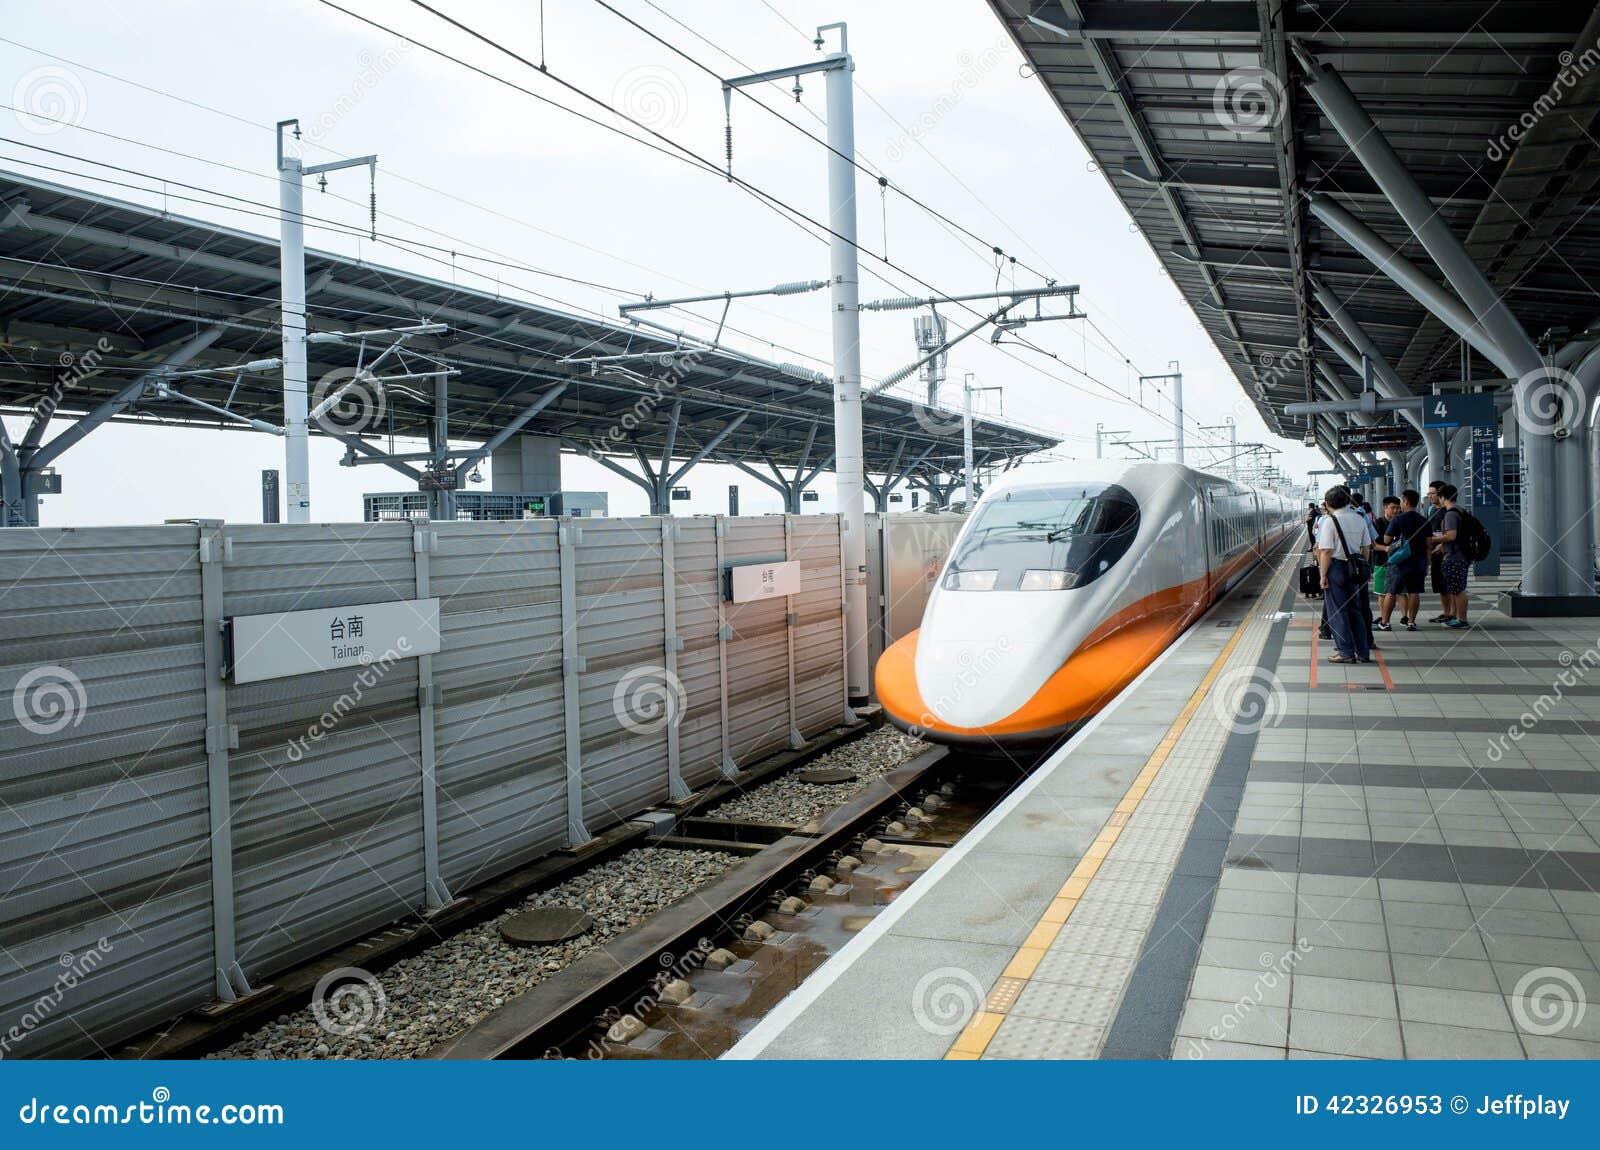 The people wait for Taiwan High Speed Rail tainan